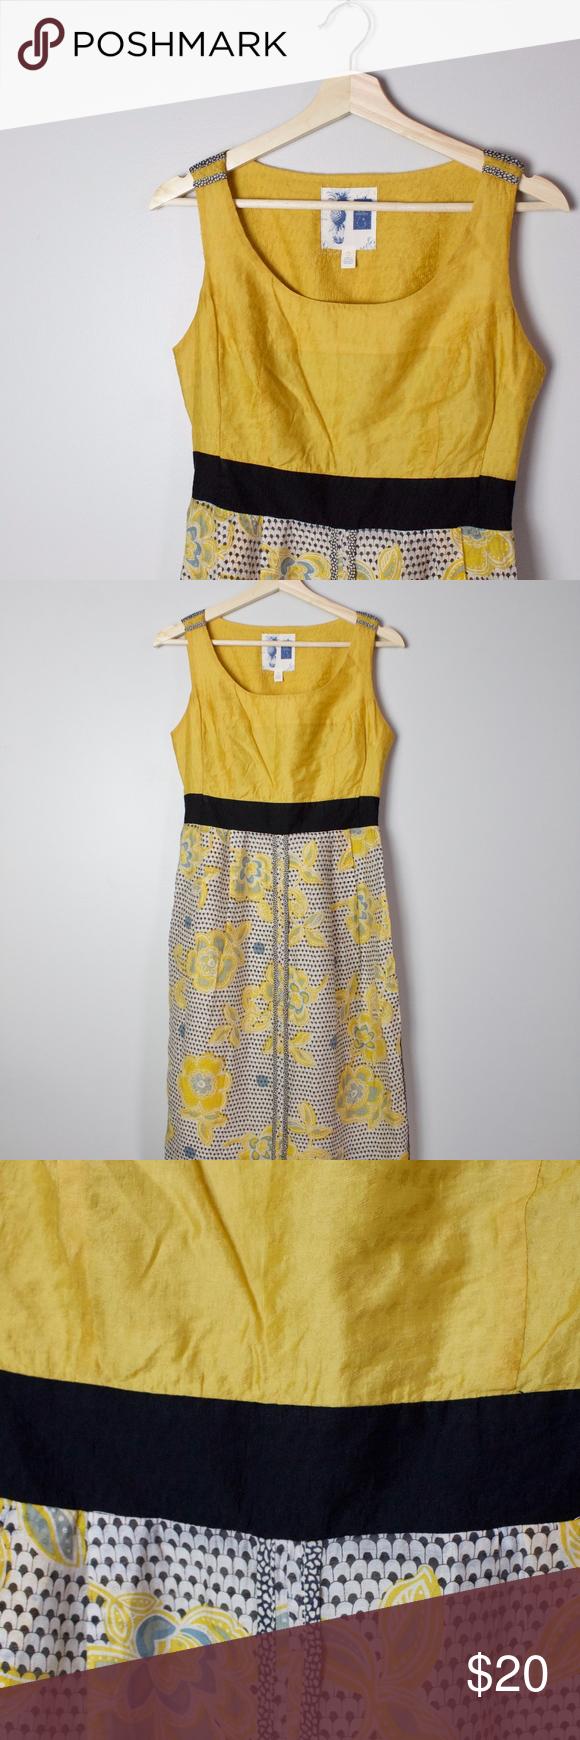 7c5131ce74bc Anthropologie Dress Edme & Esyllte Sheath Dress Lovely goldenrod sheath  dress with black waistband, floral